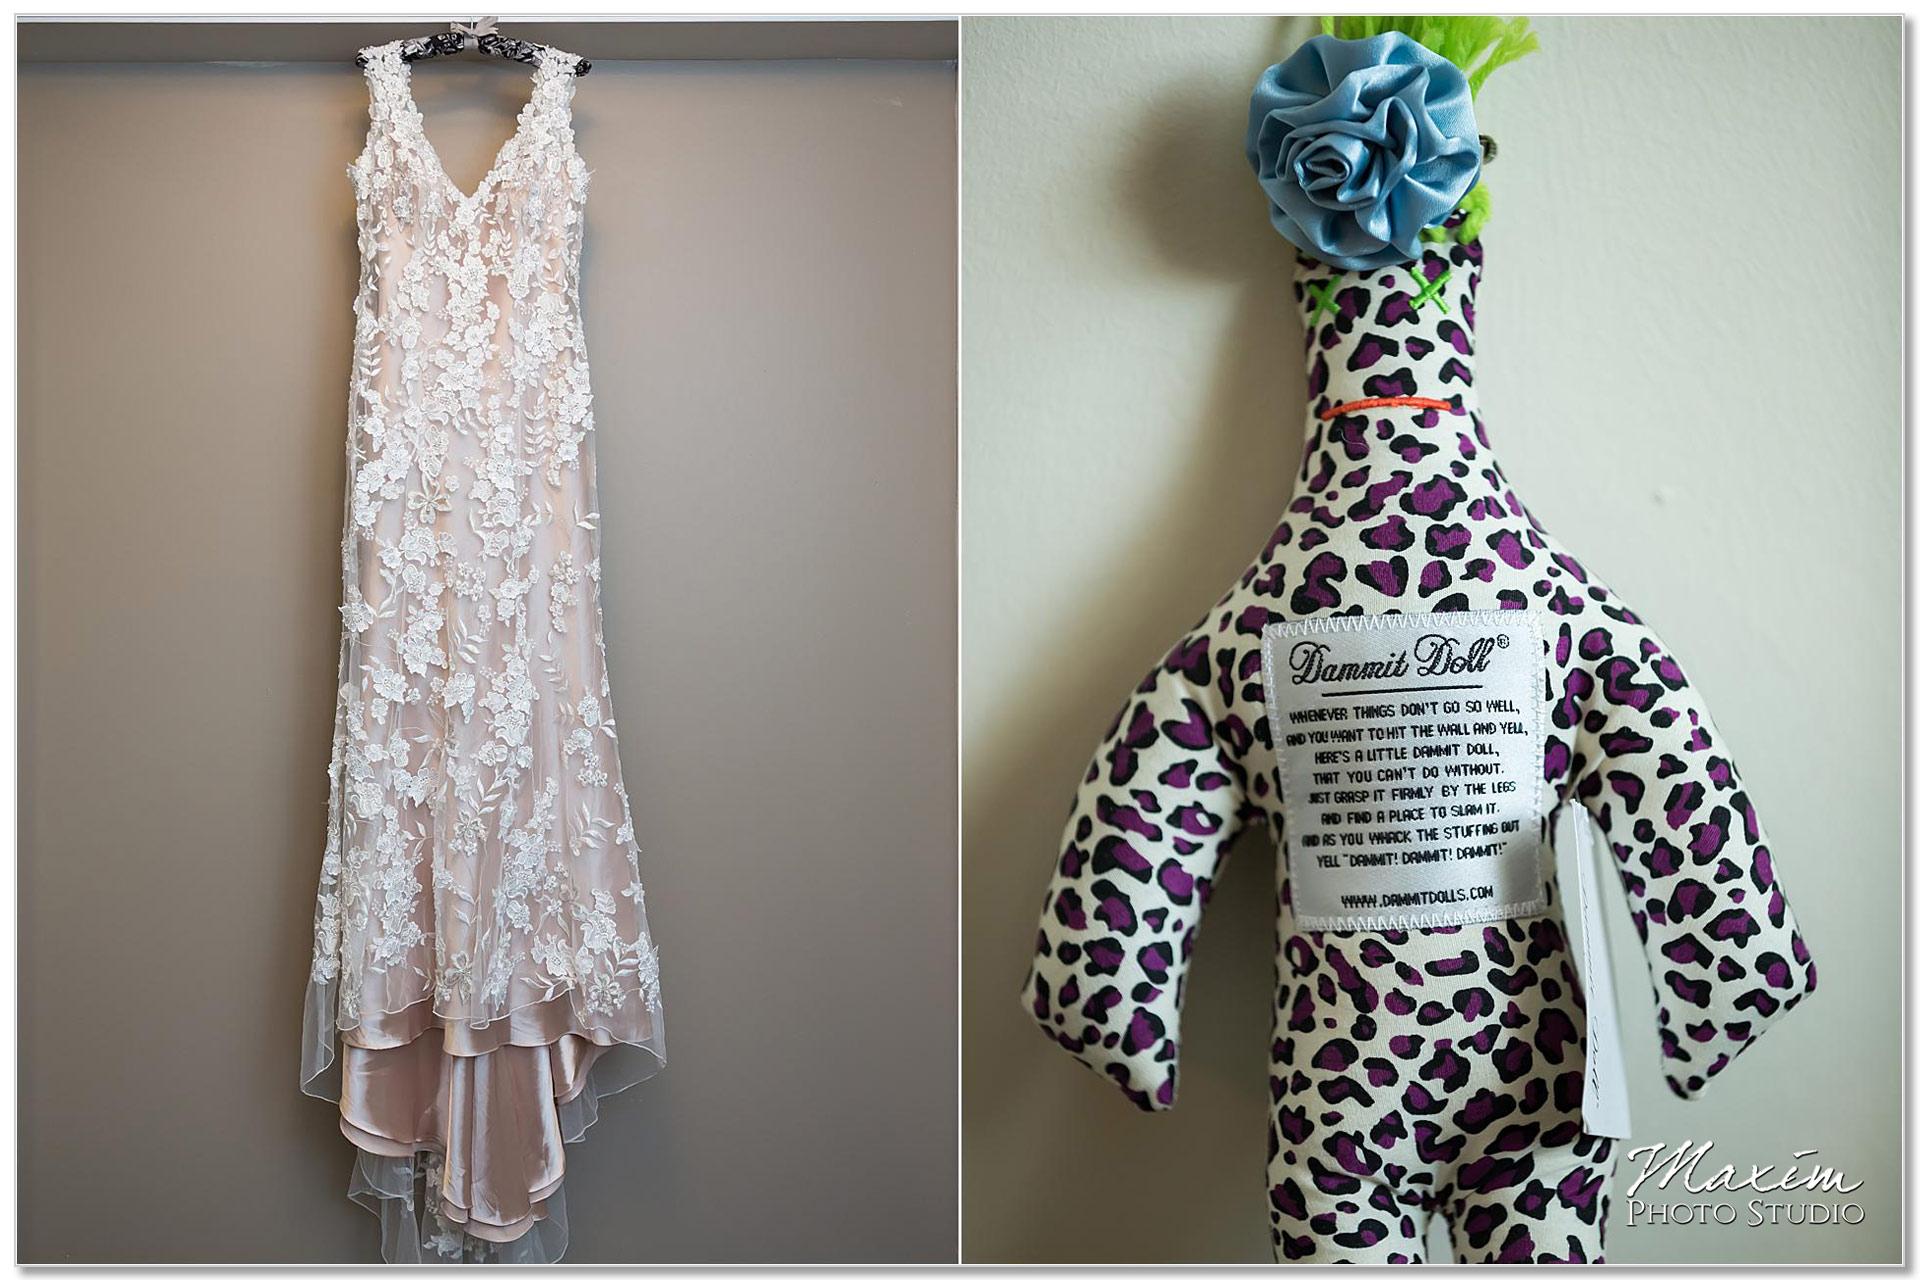 Alms Park Cincinnati Wedding dress